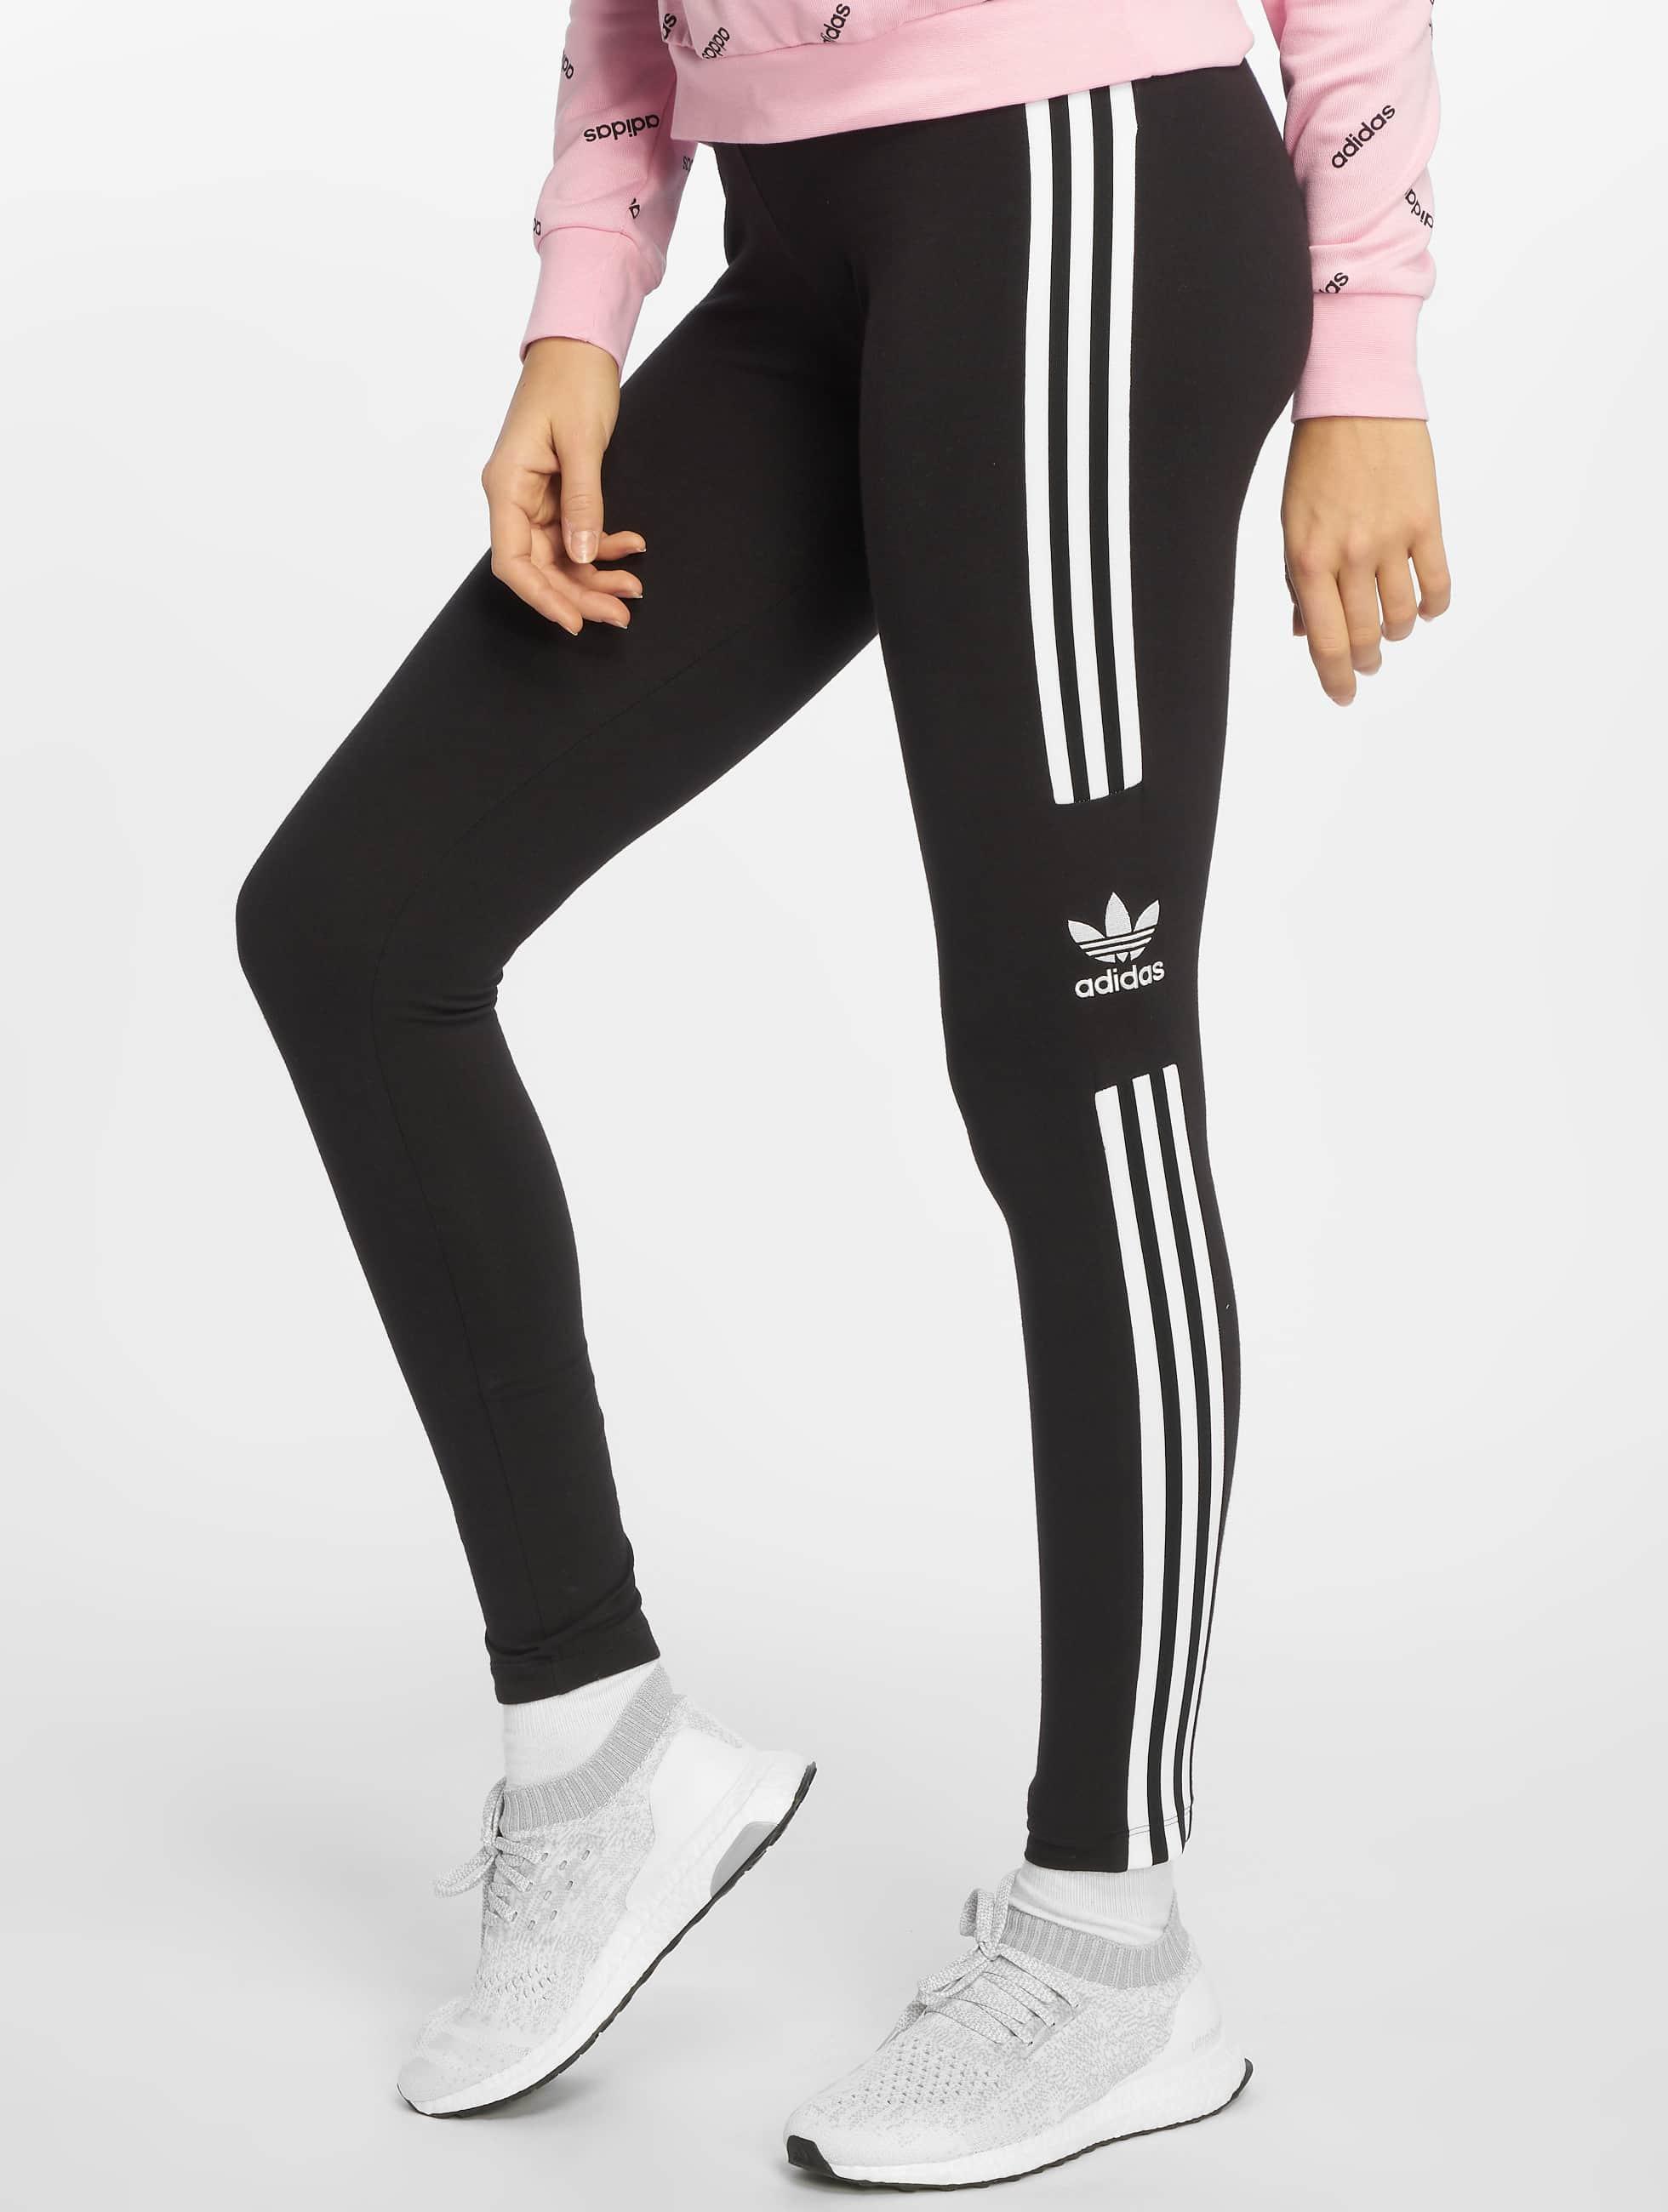 b5d242e90b3 adidas originals broek / Legging Trefoil in zwart 599063